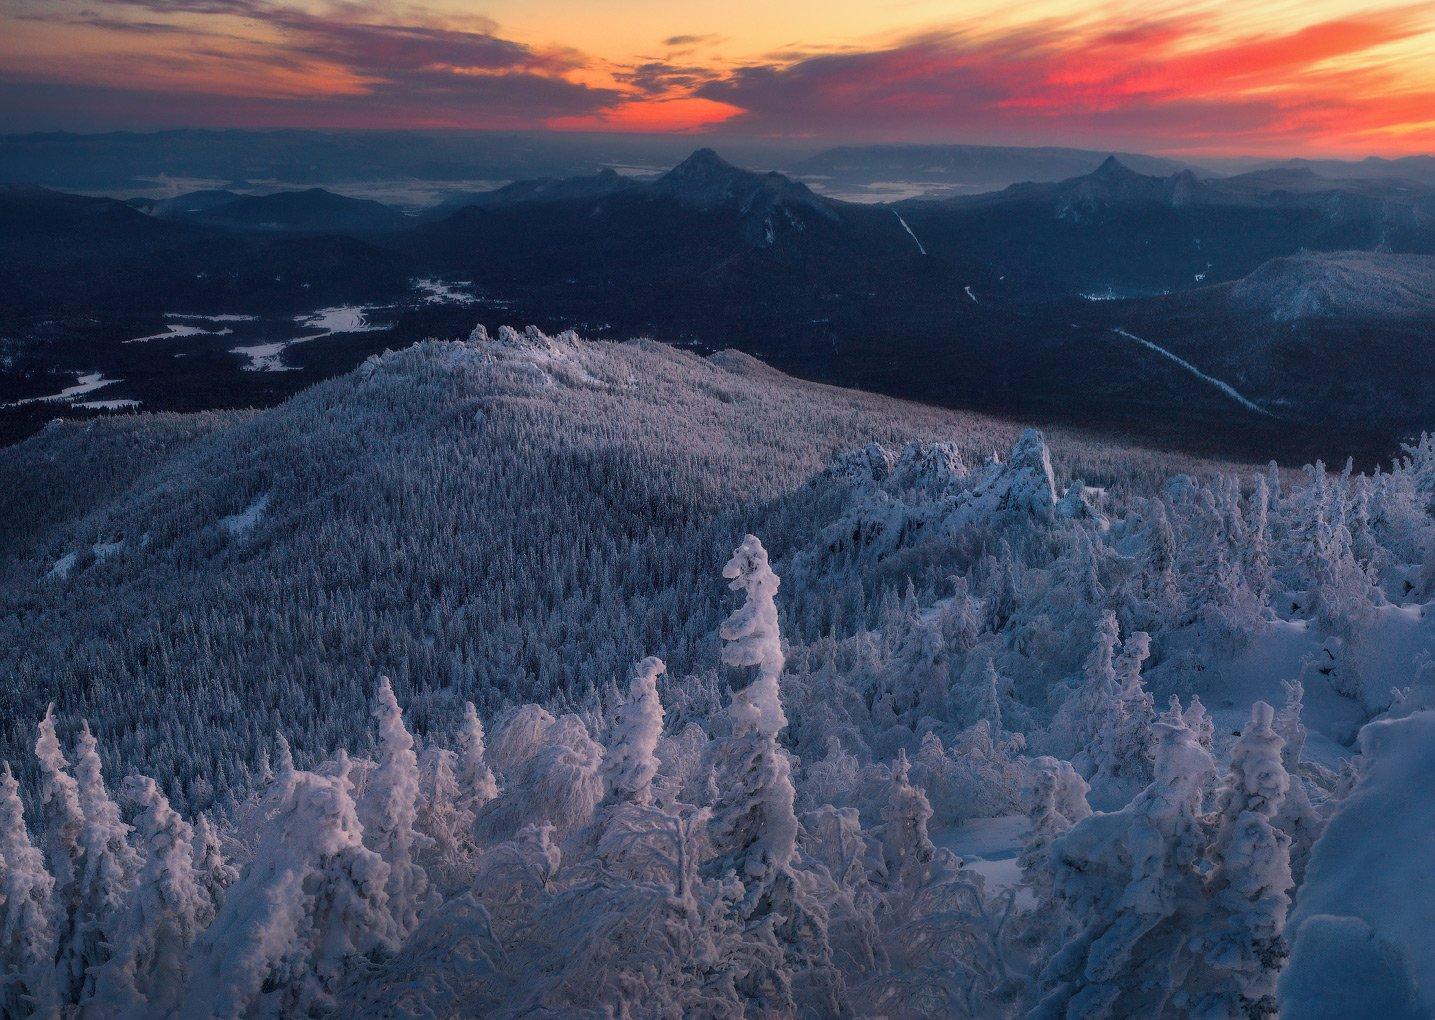 ялангас, урал, тайга, зима, горы, Владимир Ляпин